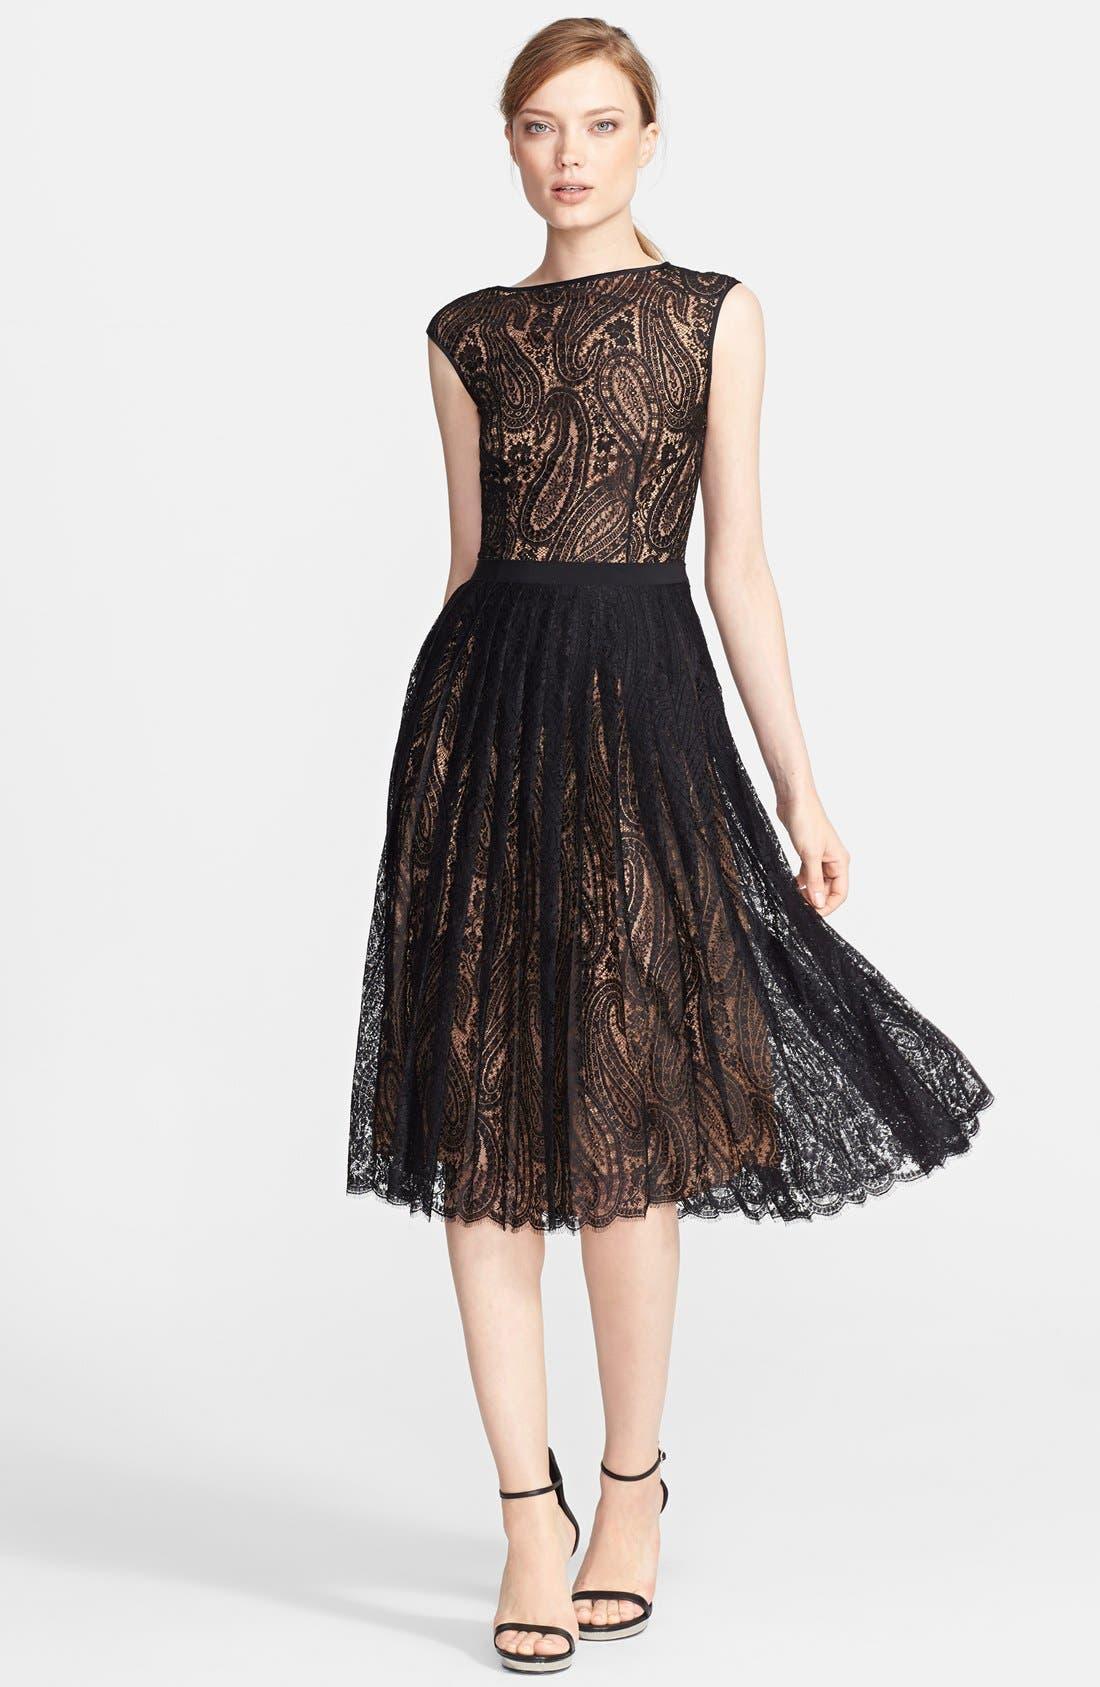 Alternate Image 1 Selected - Michael Kors Boatneck Paisley Lace Dress